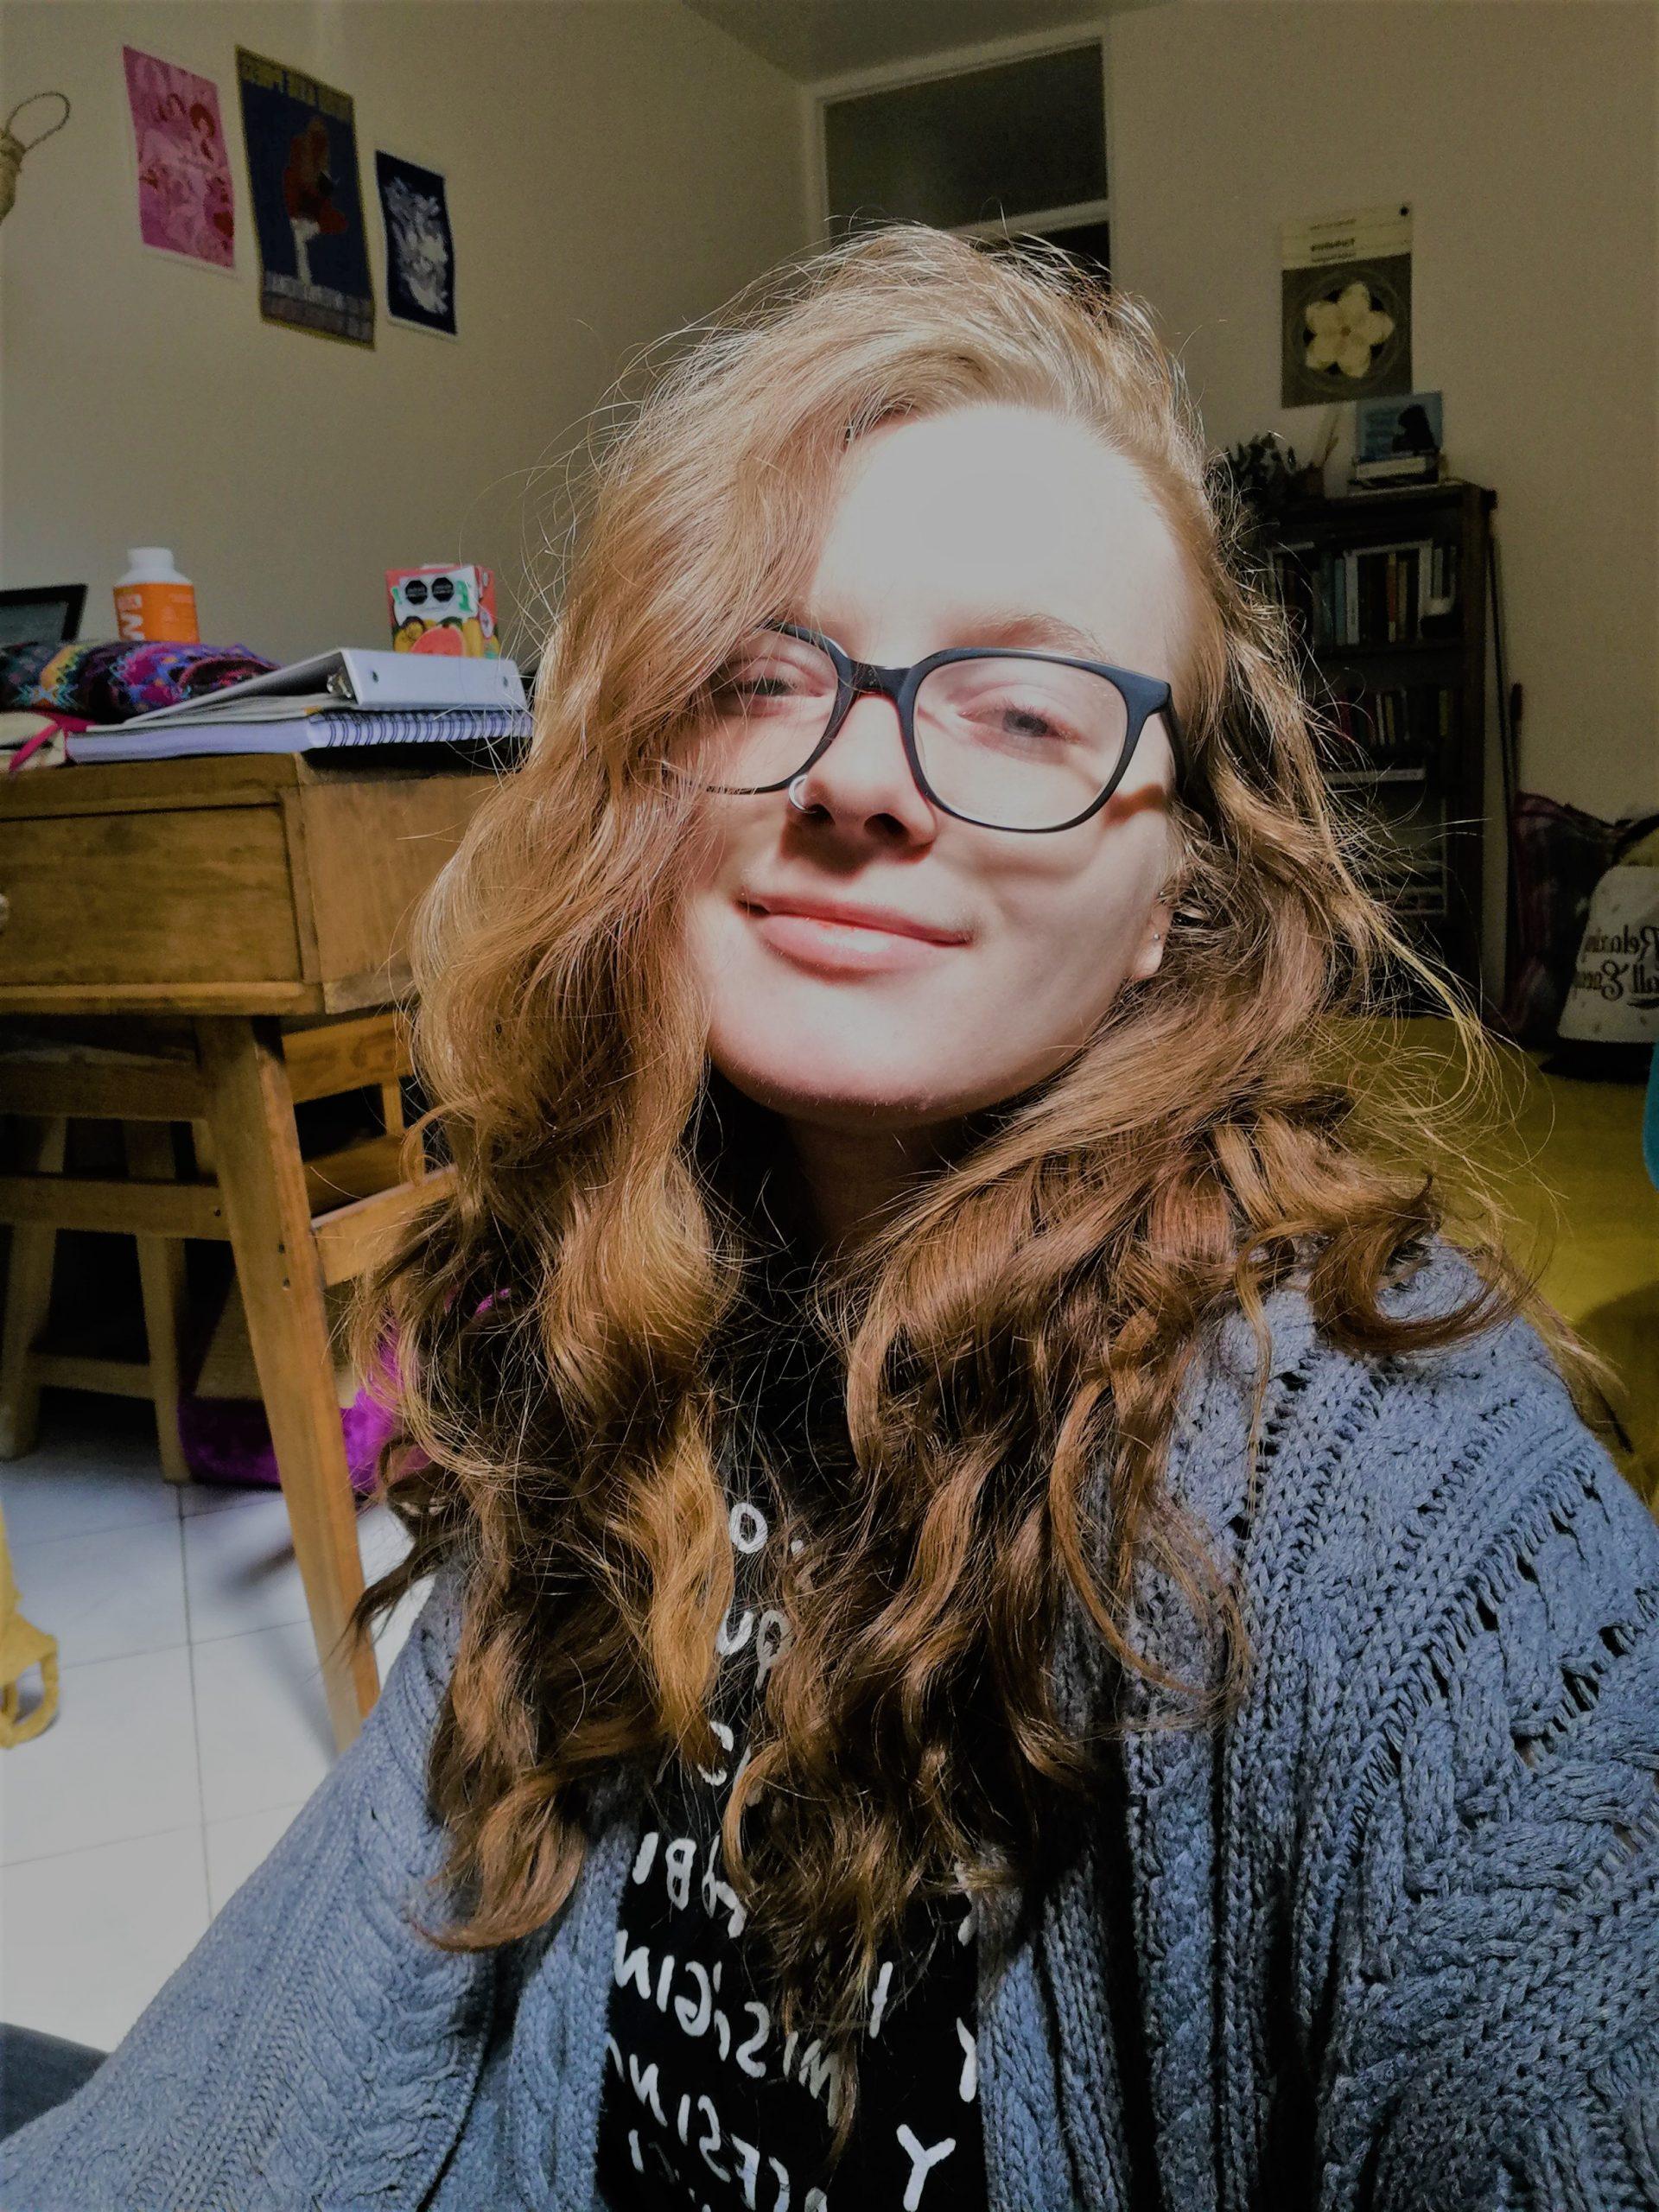 Hi! I'm Lauren